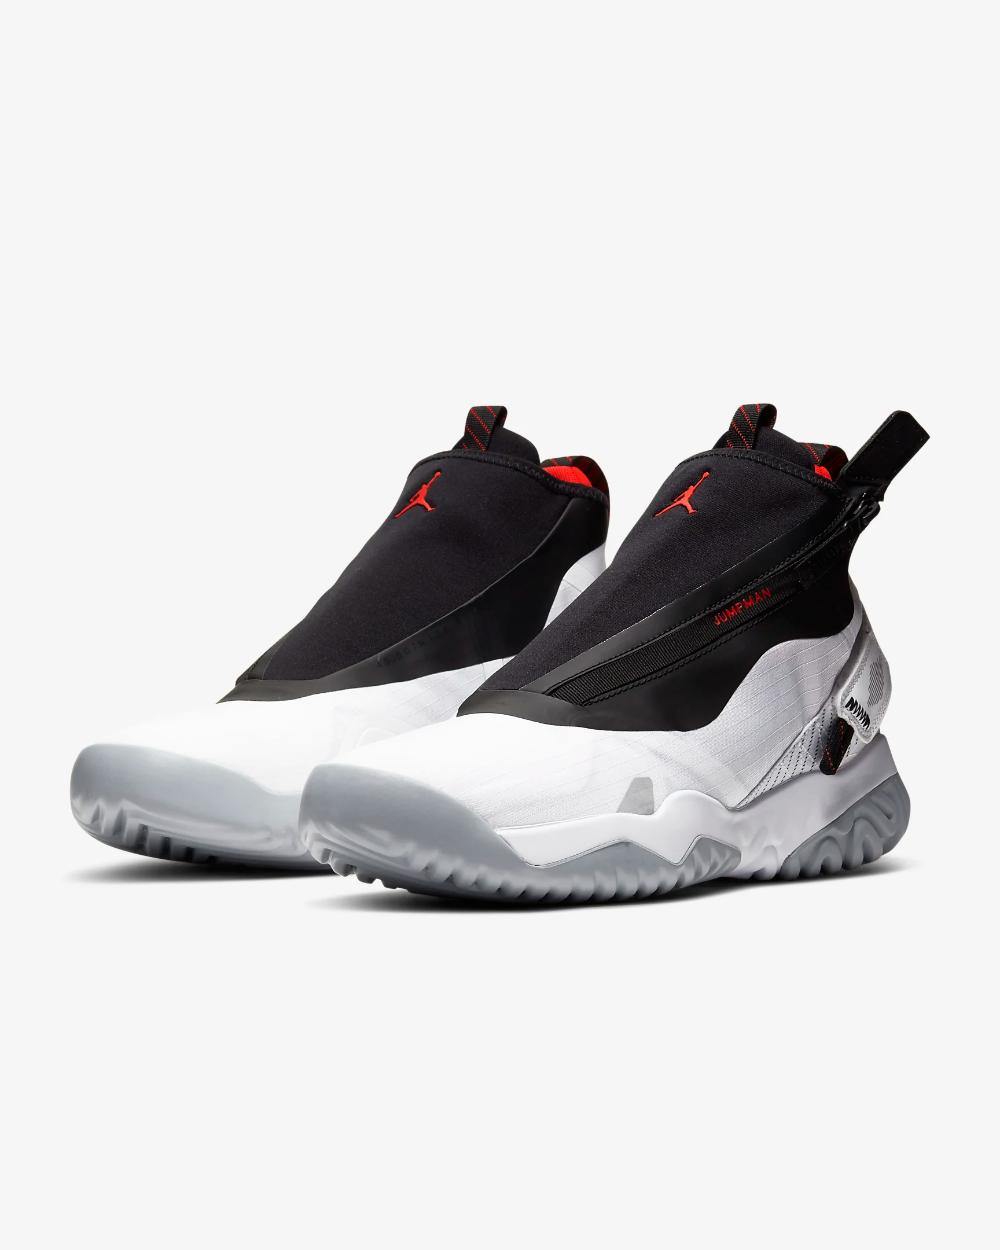 Jordan Proto React Z Shoe Nike Com Futuristic Shoes Cute Addidas Shoes Adventure Shoes